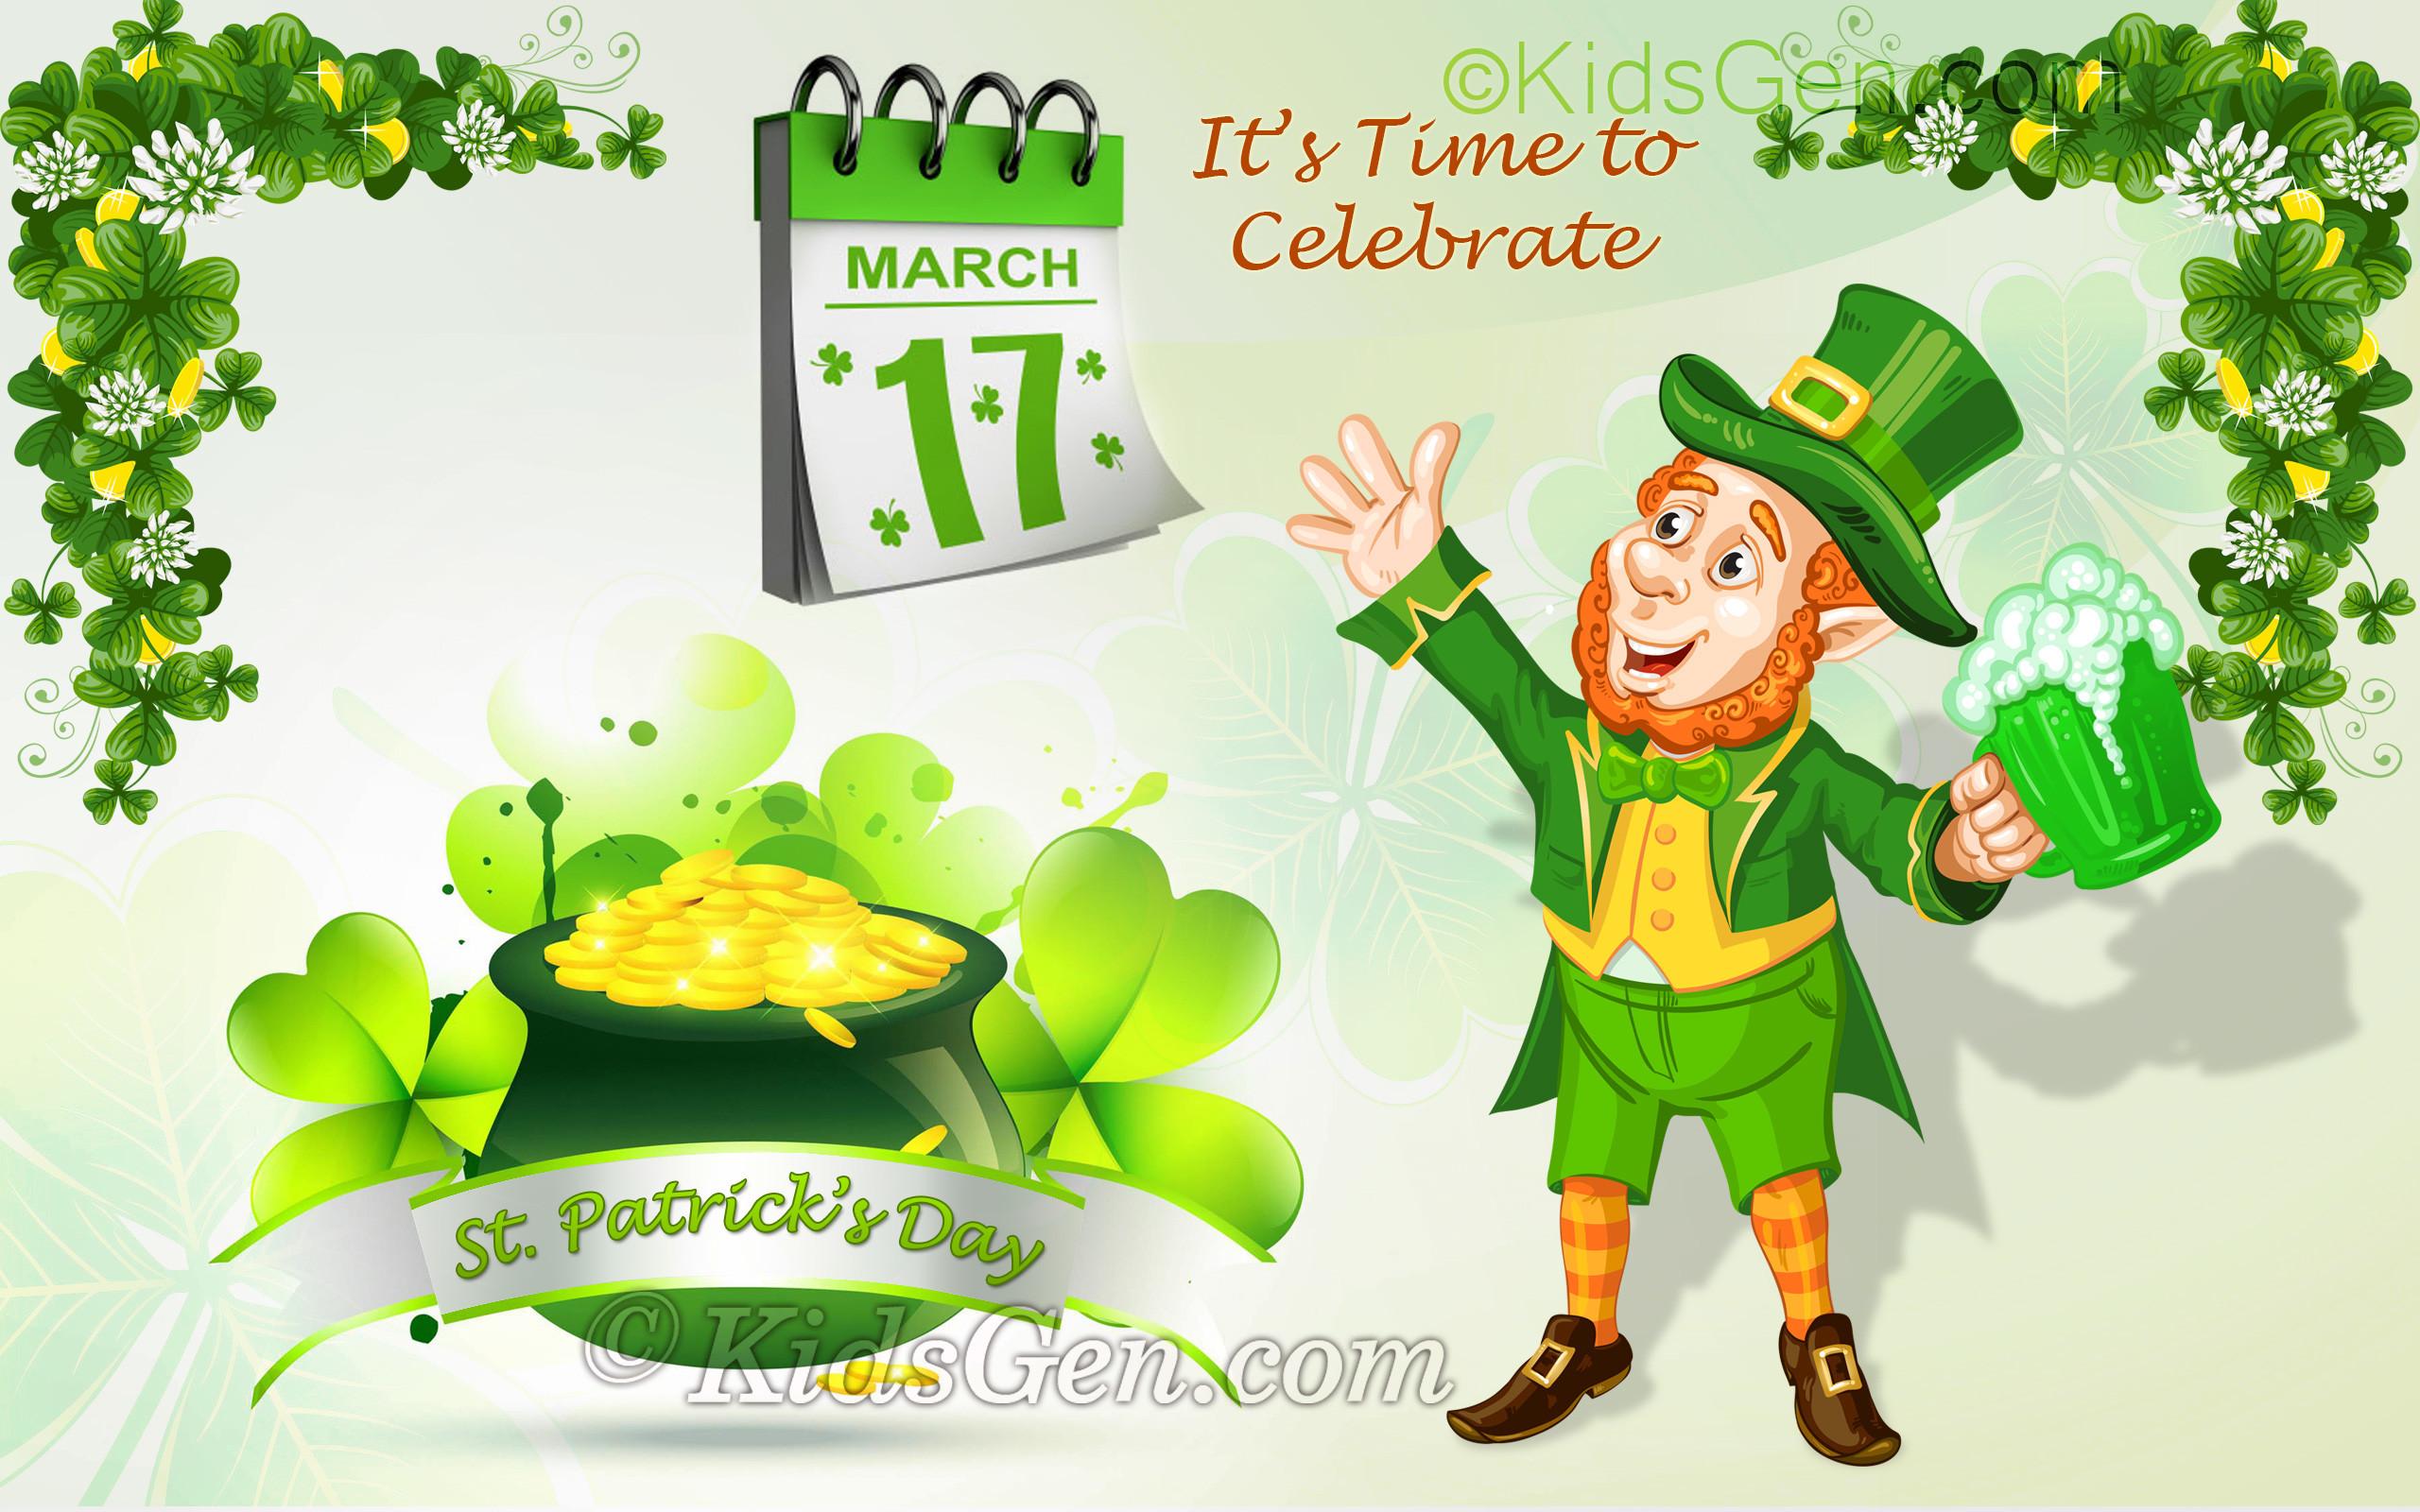 St. Patrick's Day Wallpaper for kids